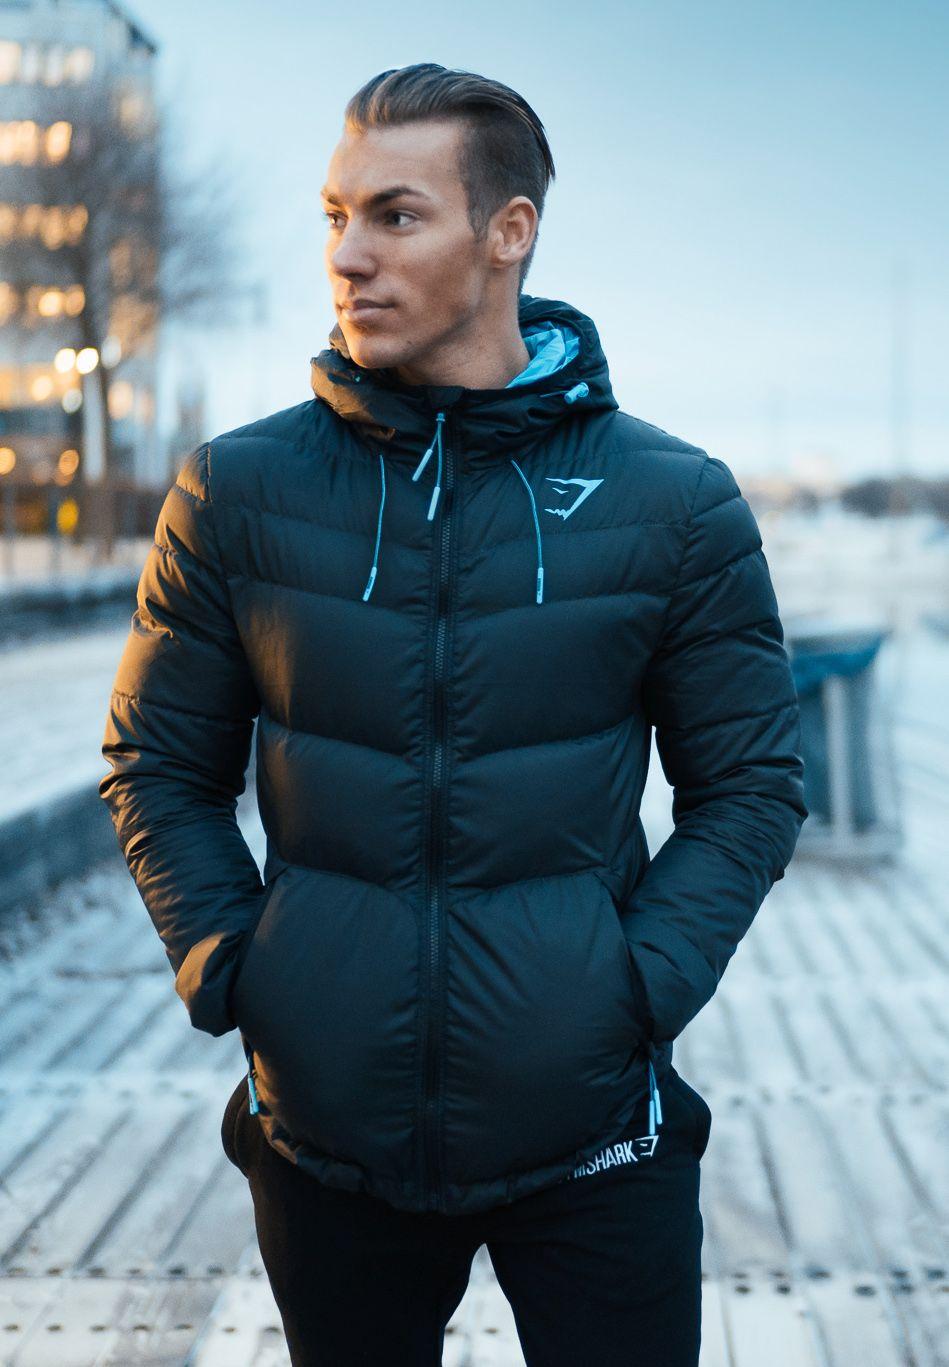 Fitted Sector Puffer Jacket Black Gymshark Pakaian Pria Pria Pakaian [ 1367 x 949 Pixel ]